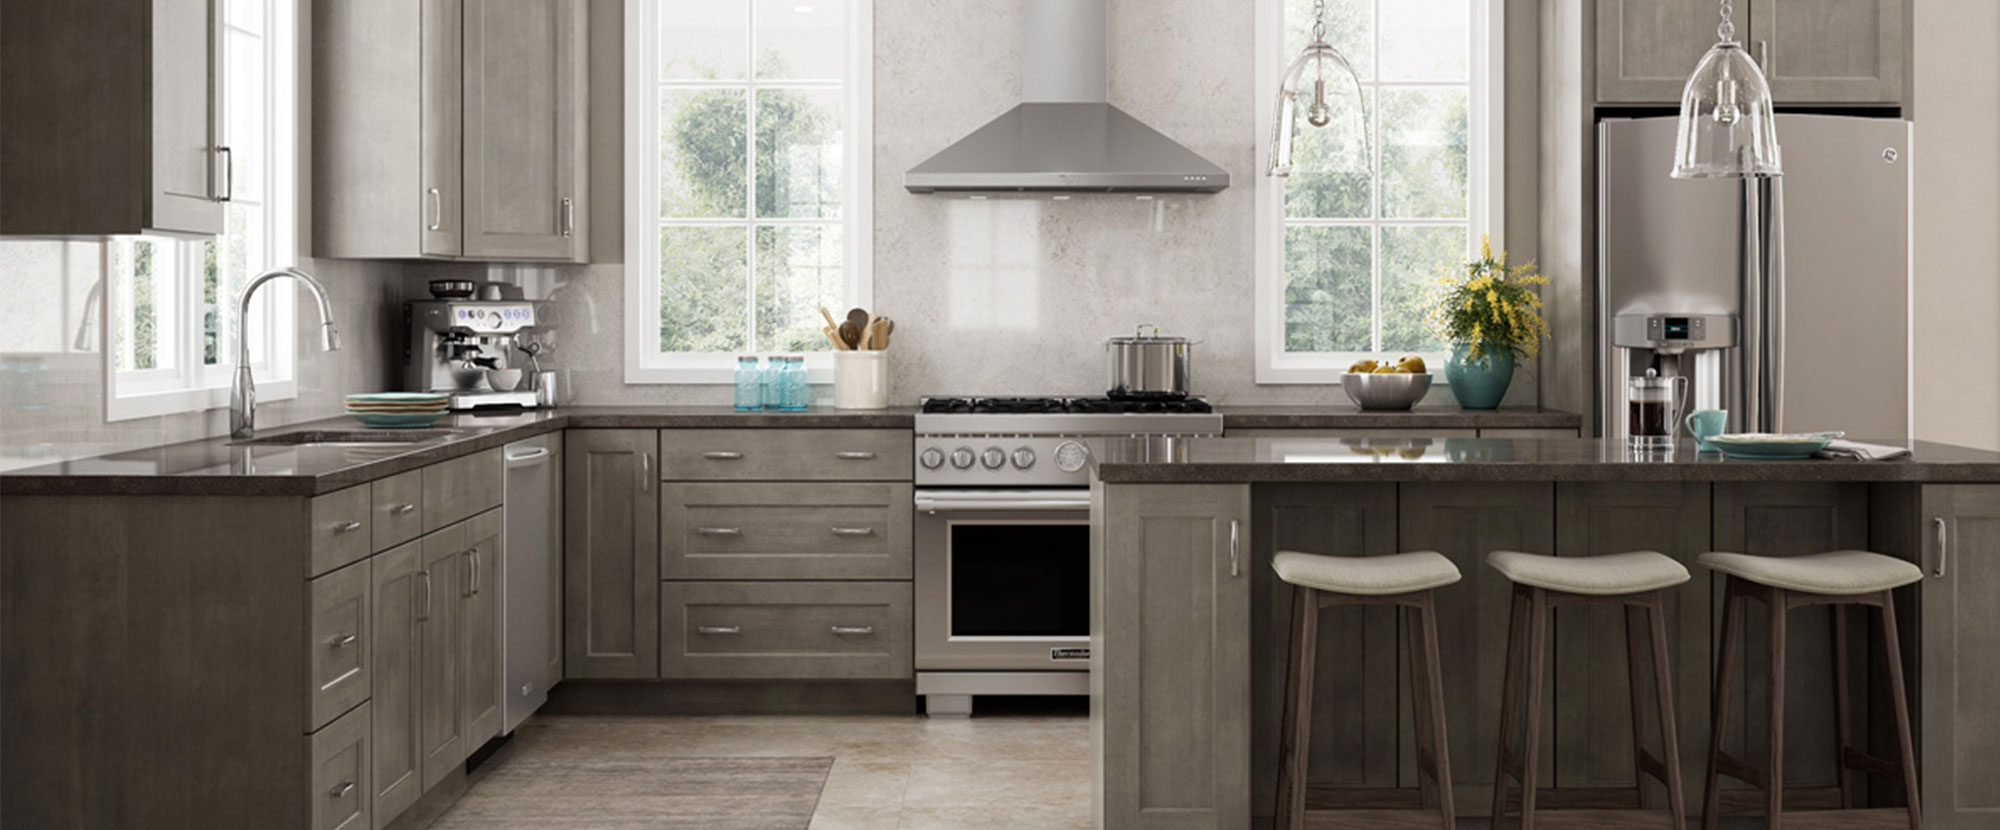 Bathroom & Kitchen Cabinets, Countertop Installation ...